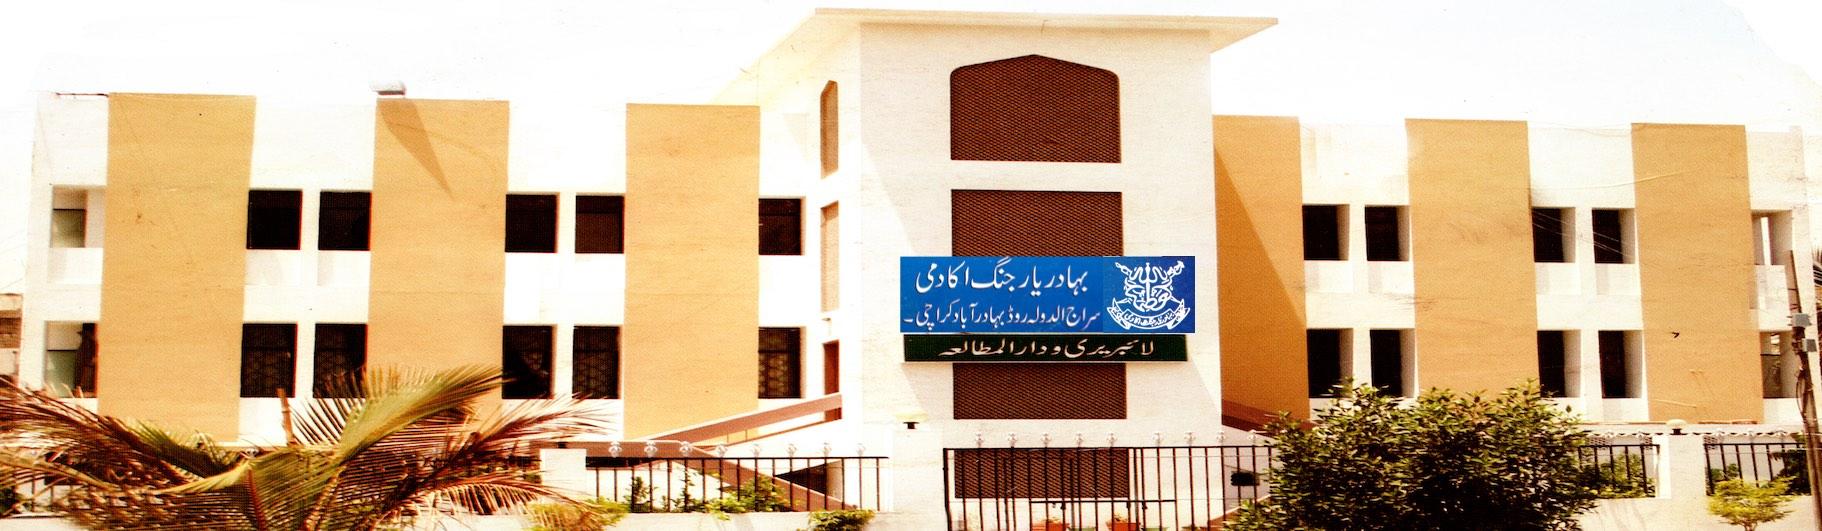 Bahadur yar Jang Academy